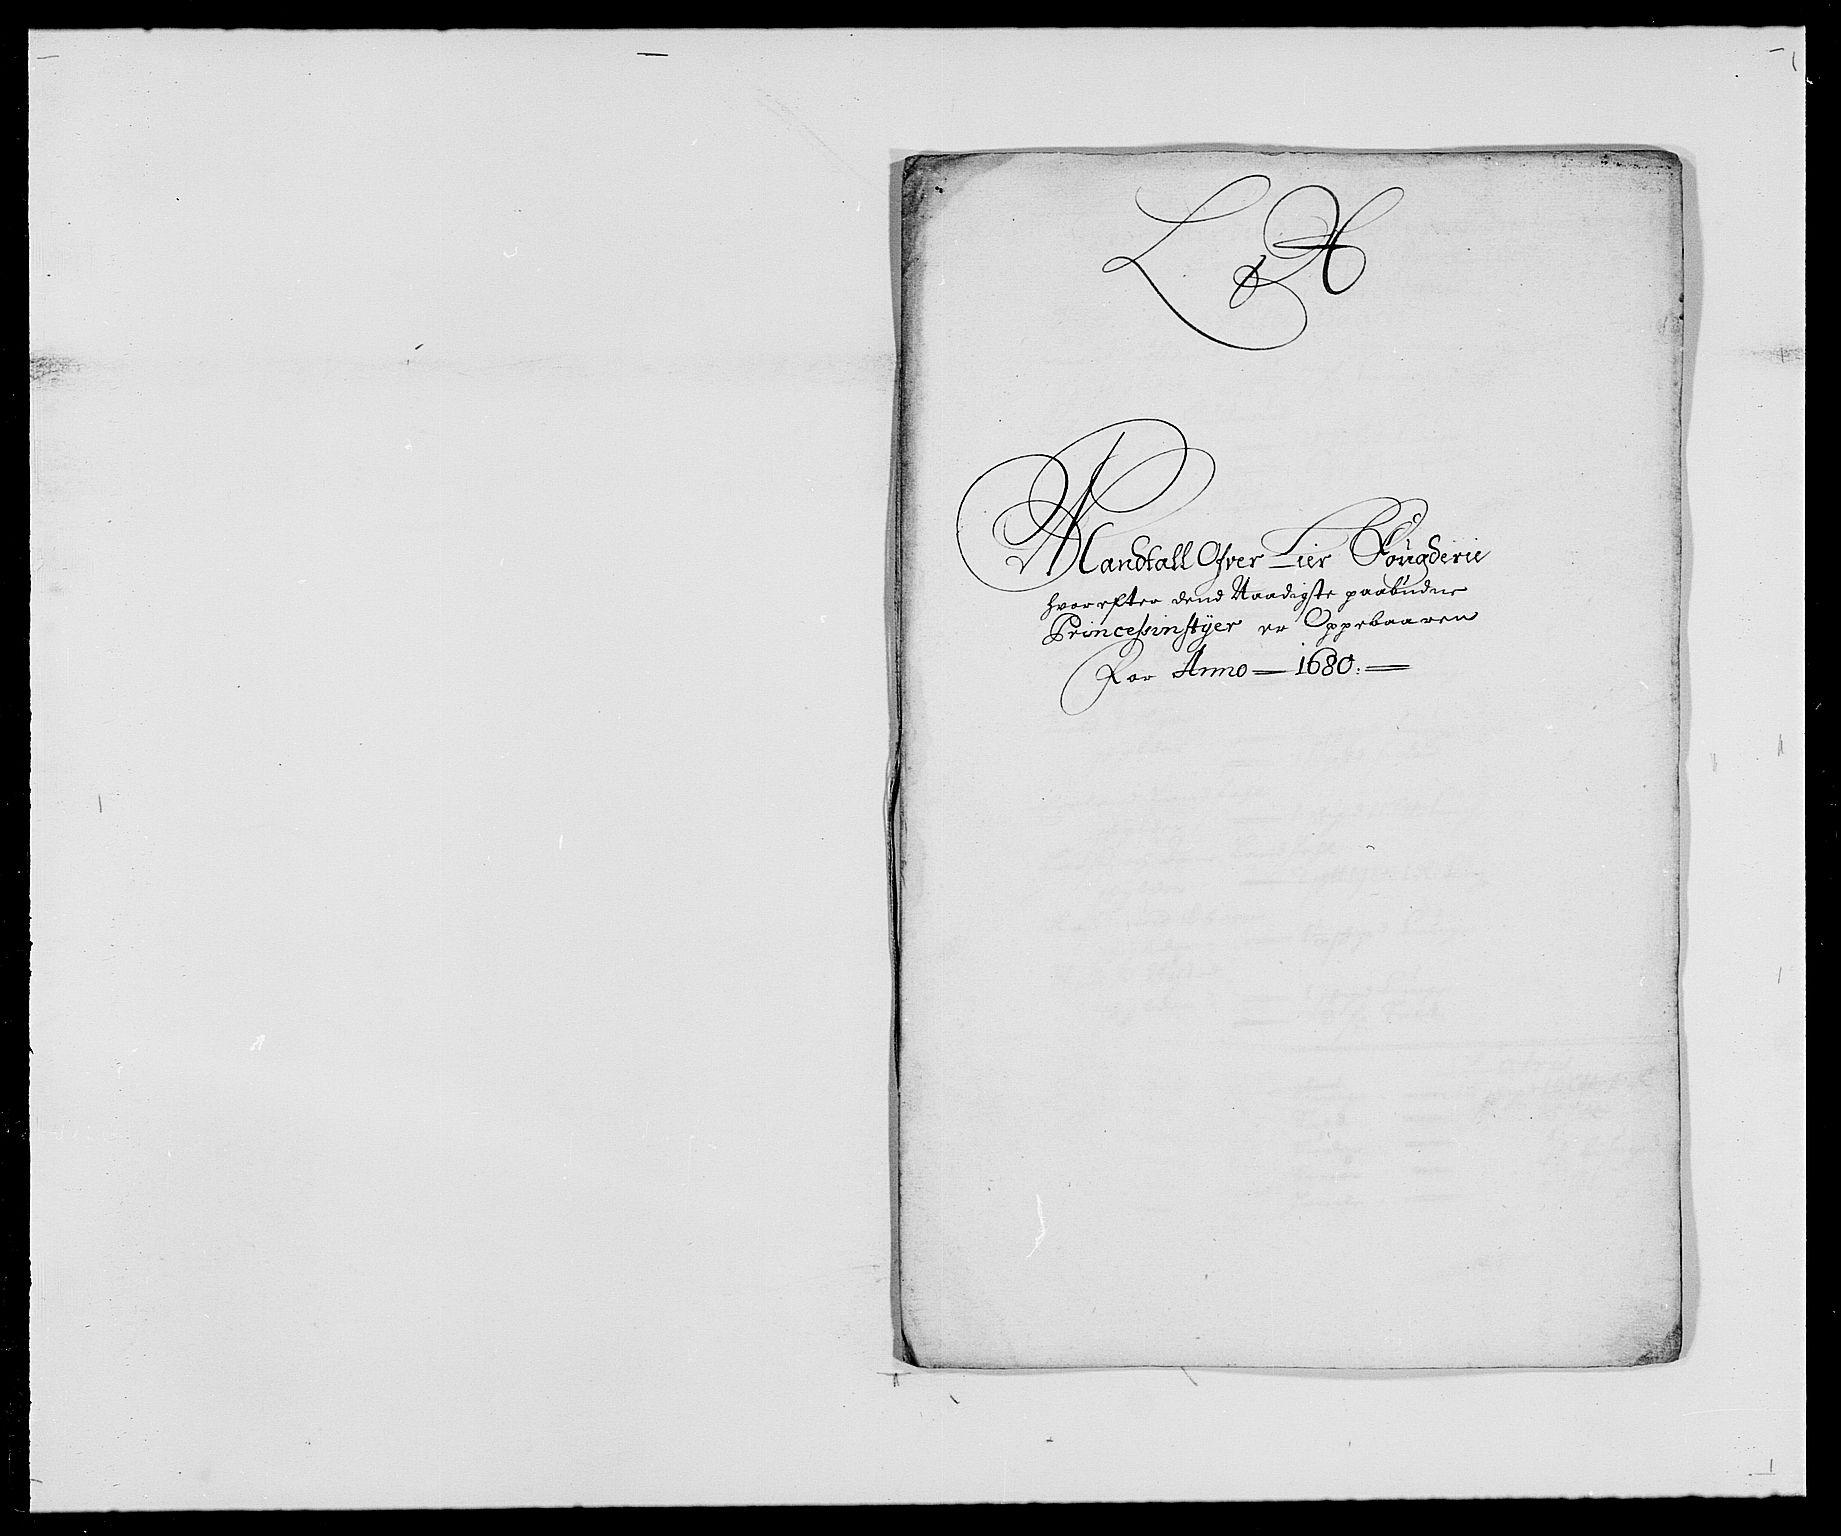 RA, Rentekammeret inntil 1814, Reviderte regnskaper, Fogderegnskap, R27/L1686: Fogderegnskap Lier, 1678-1686, s. 285